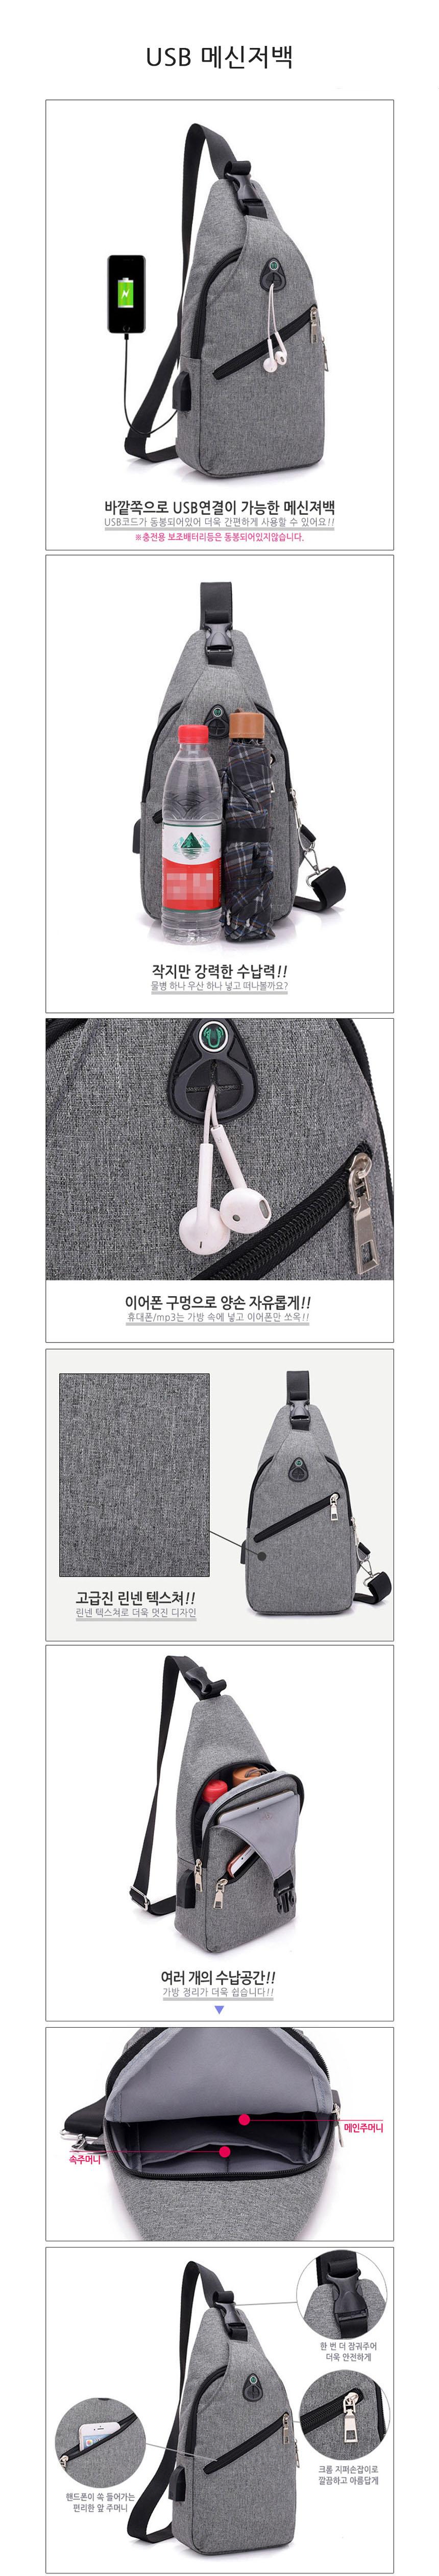 USB 메신저백 슬링백 - 민이네, 9,000원, 크로스백, 패브릭크로스백